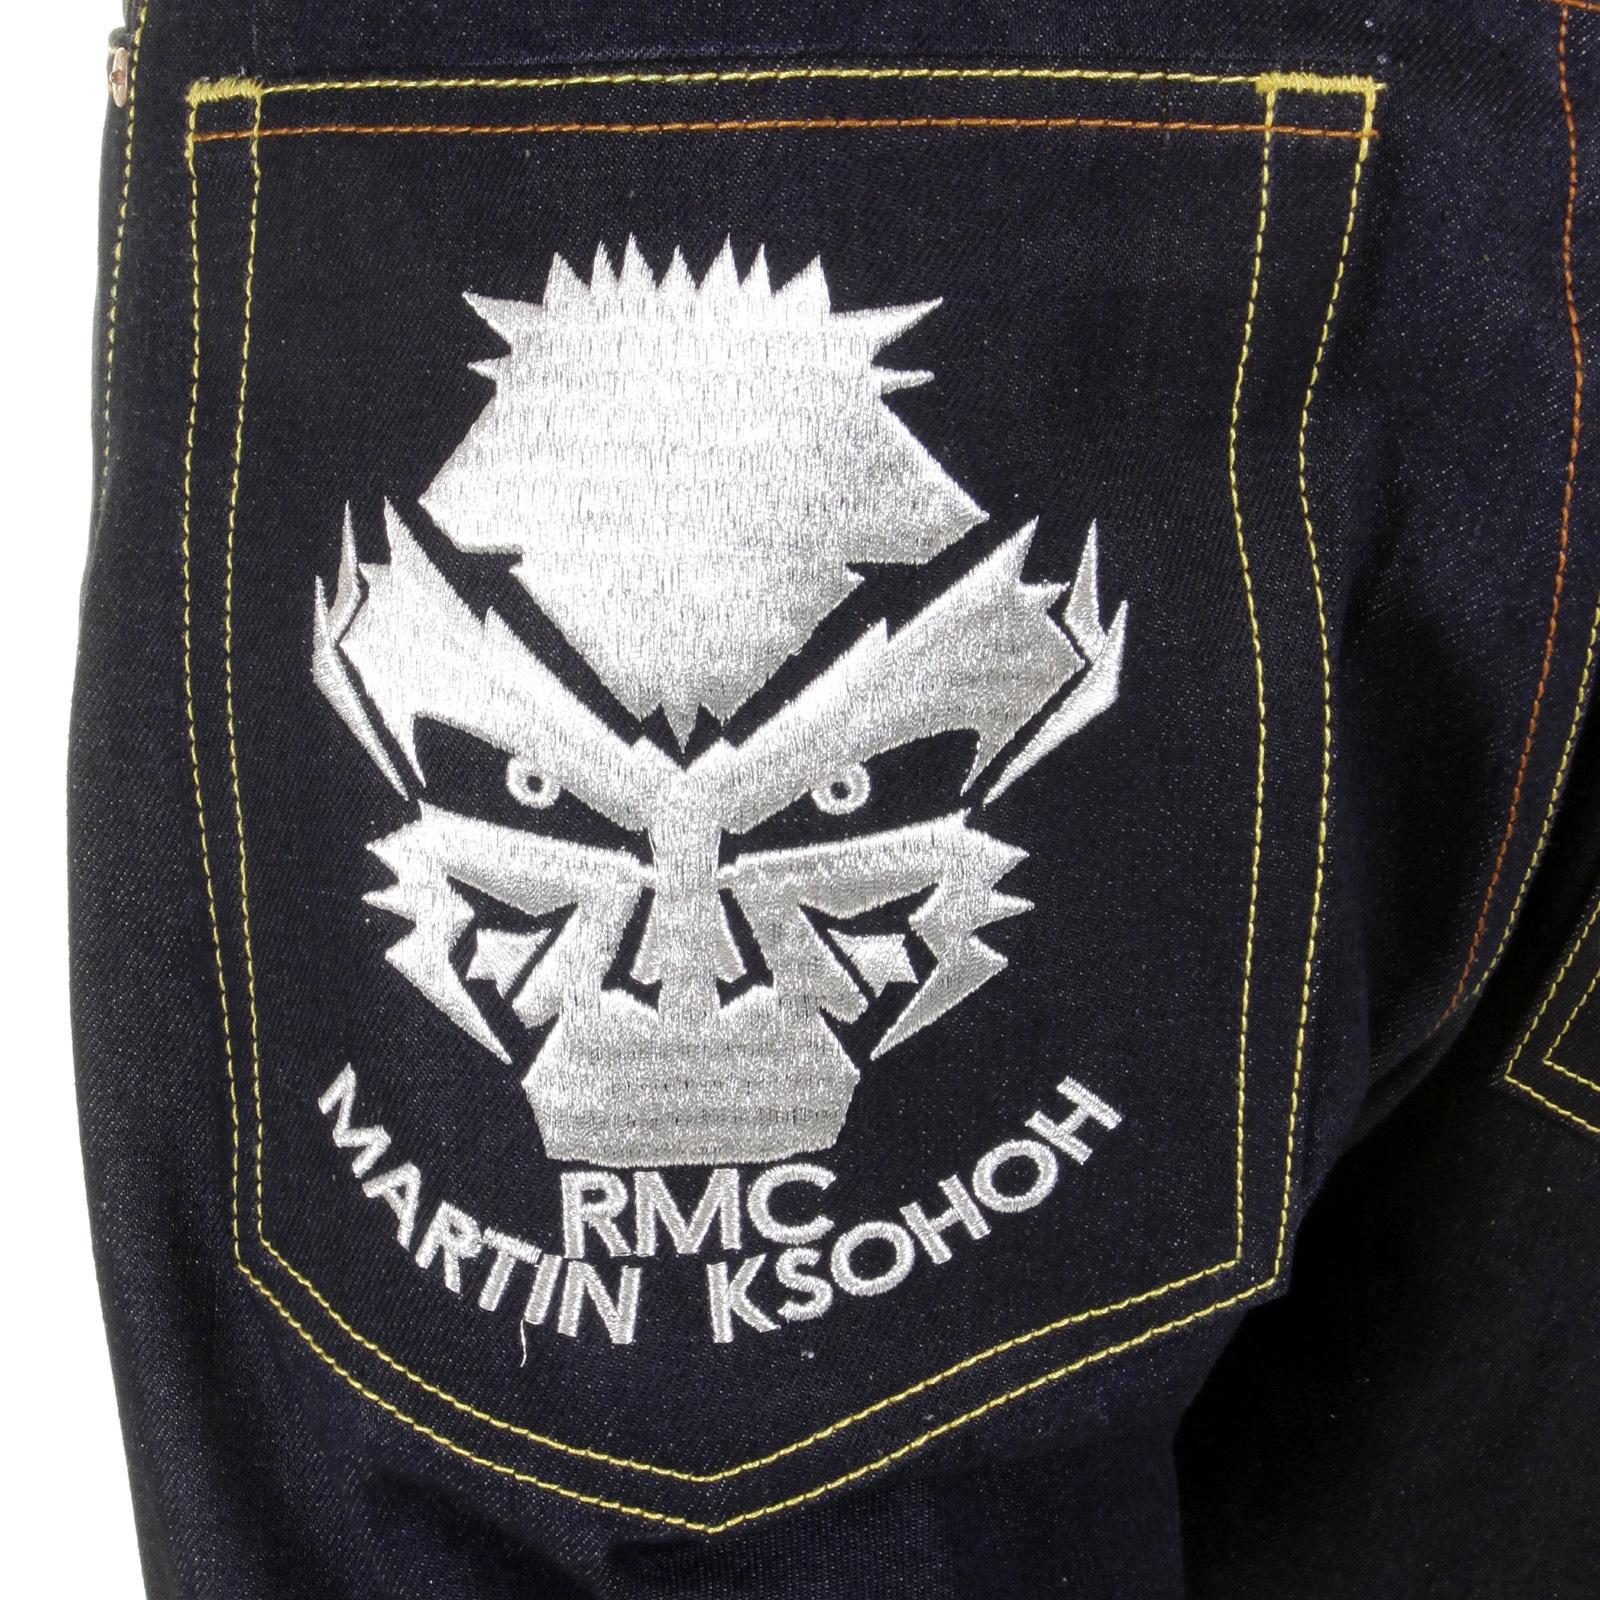 RMC JEANS Gold Empire Cyber Monkey slimmer cut 1001 model denim jean REDM1148